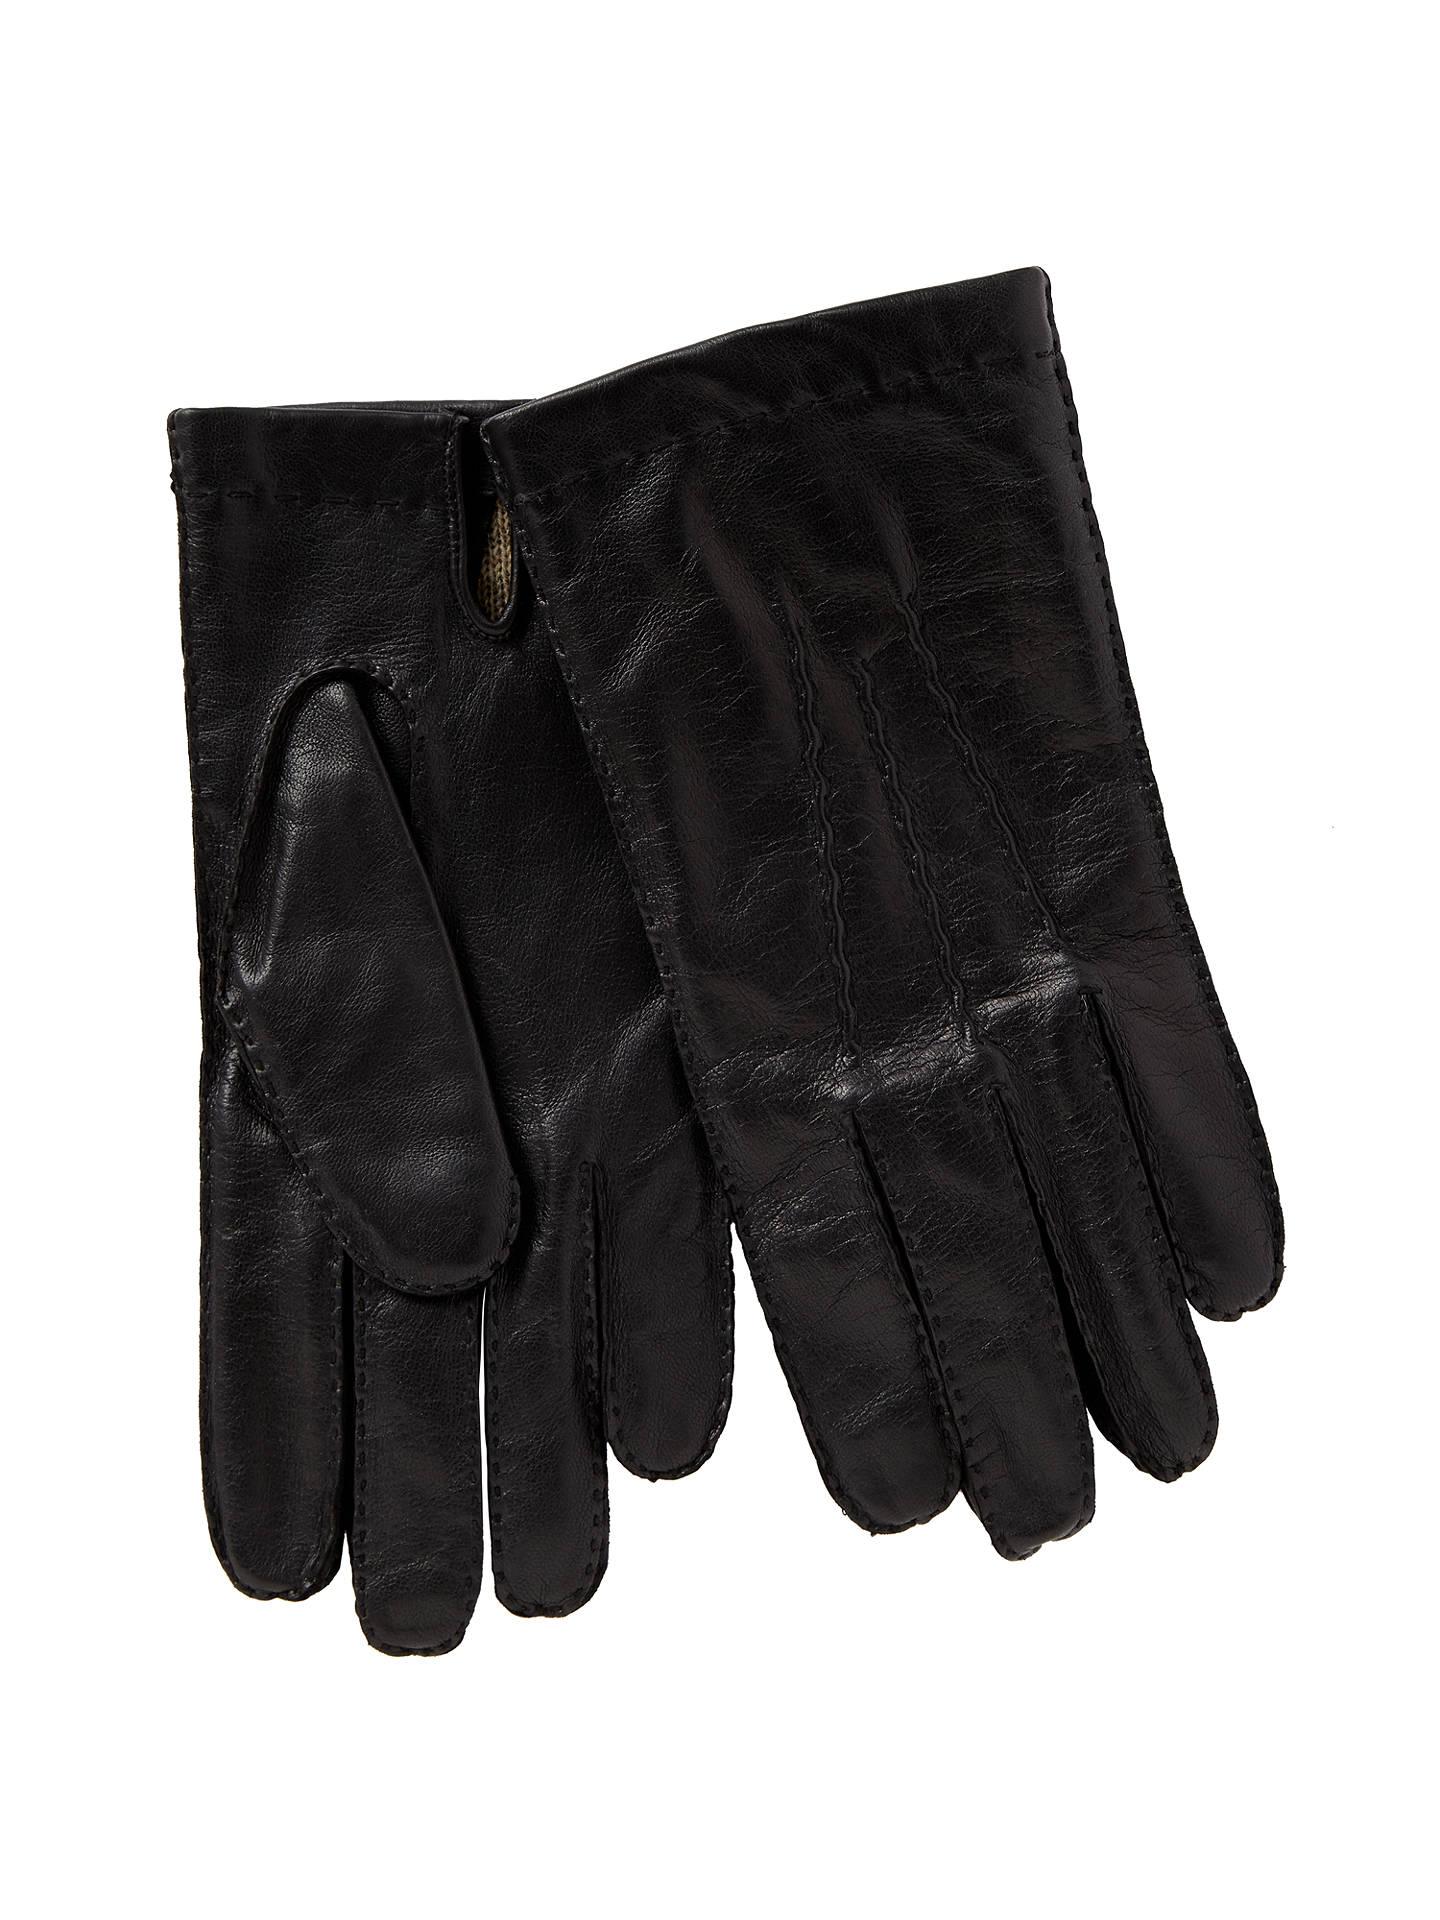 6d1bbf37072c4 Buy John Lewis Wool Lined Handsewn Leather Gloves, Black, S Online at  johnlewis.